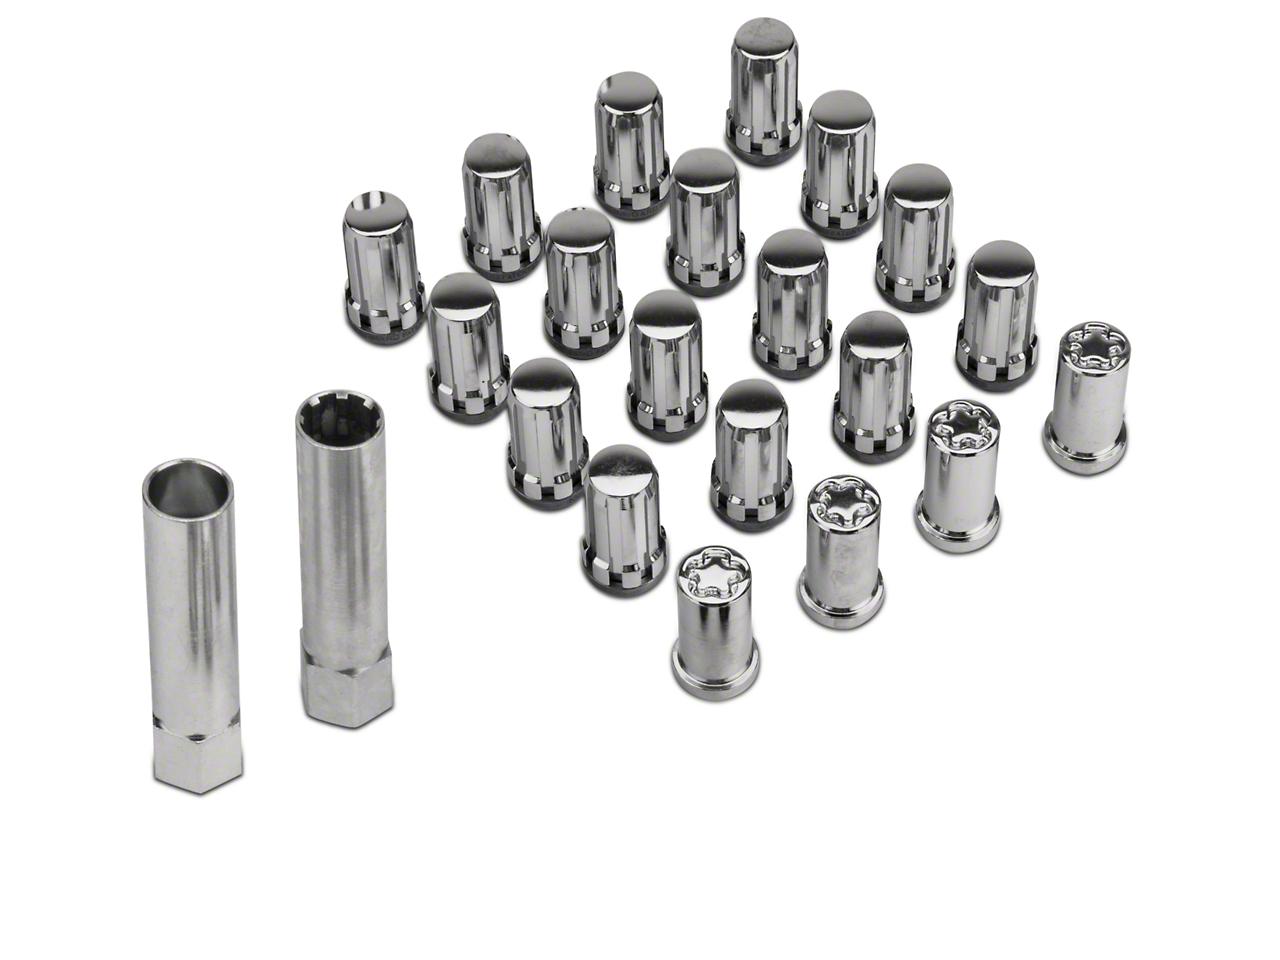 McGard Tuner Style Lug Nut Kit w/ Locks - Chrome (79-14 All)